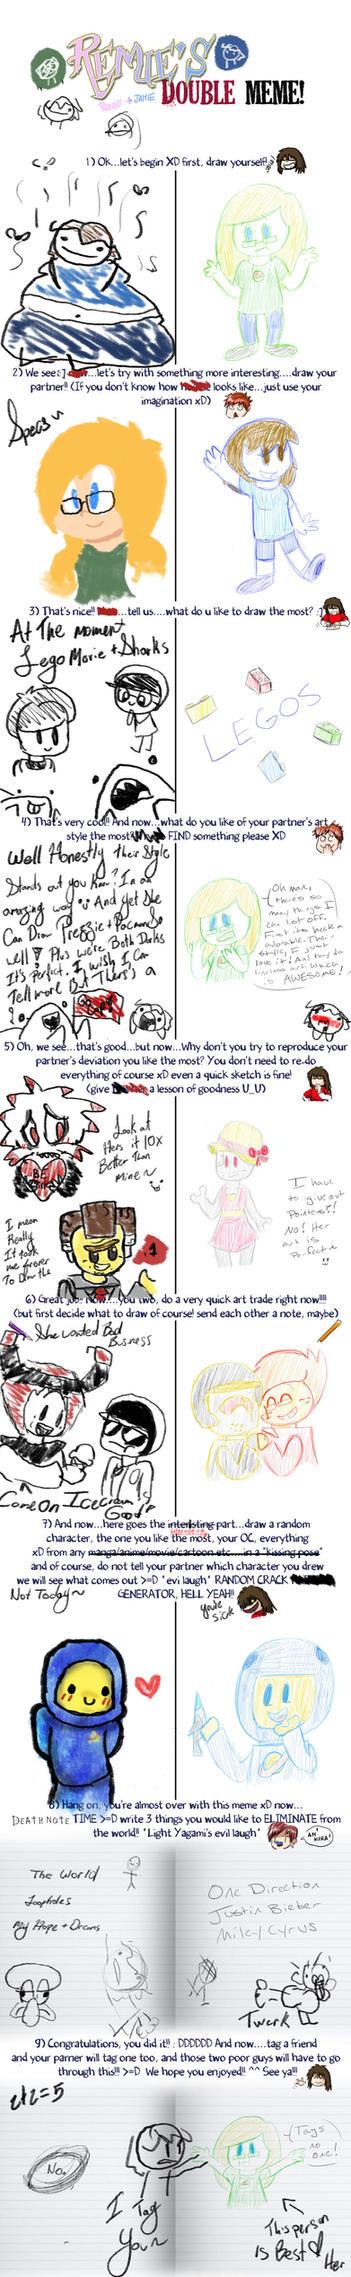 Double Friend Meme with Captain-Specs! by kakashicoke